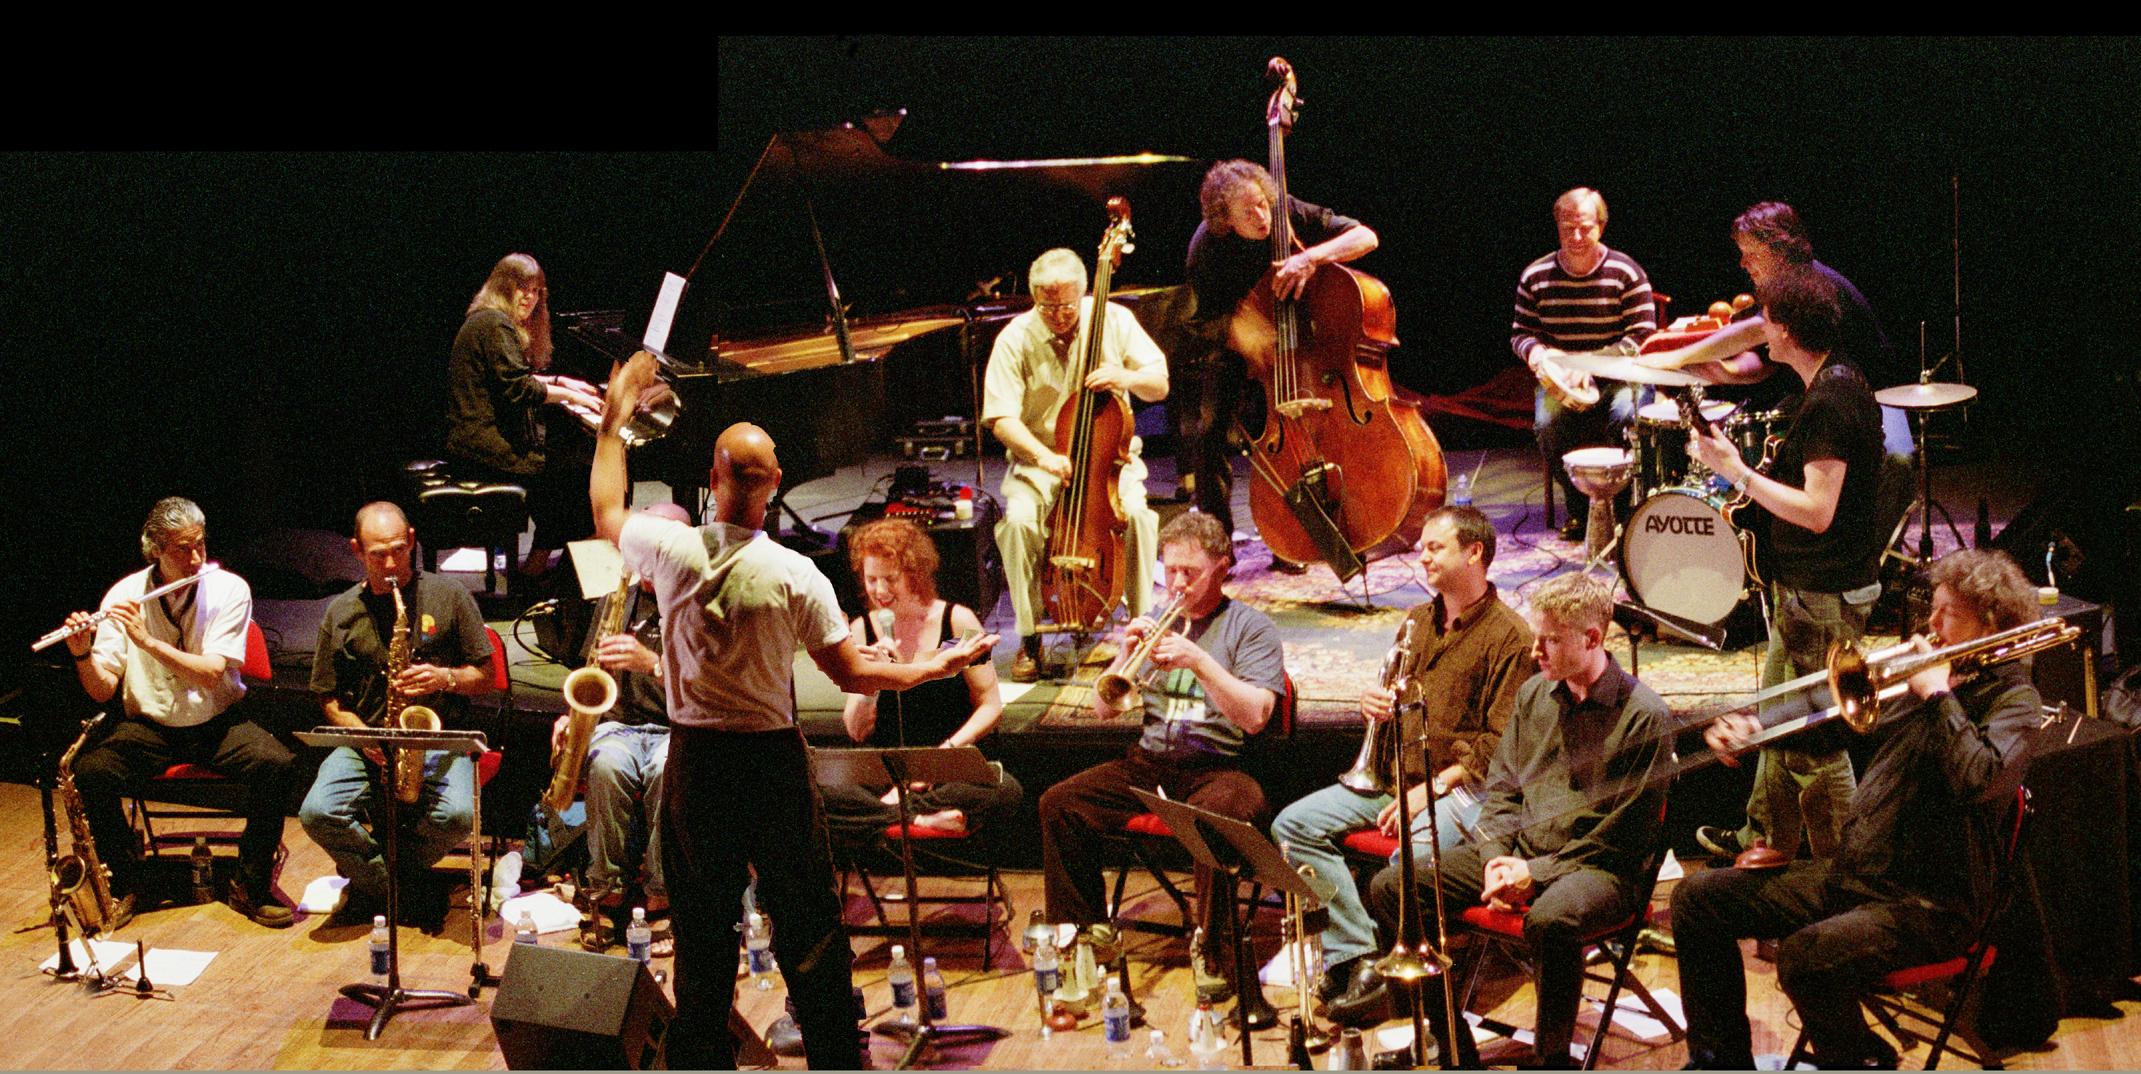 now_orchestra_crispell_svirchev_.jpg